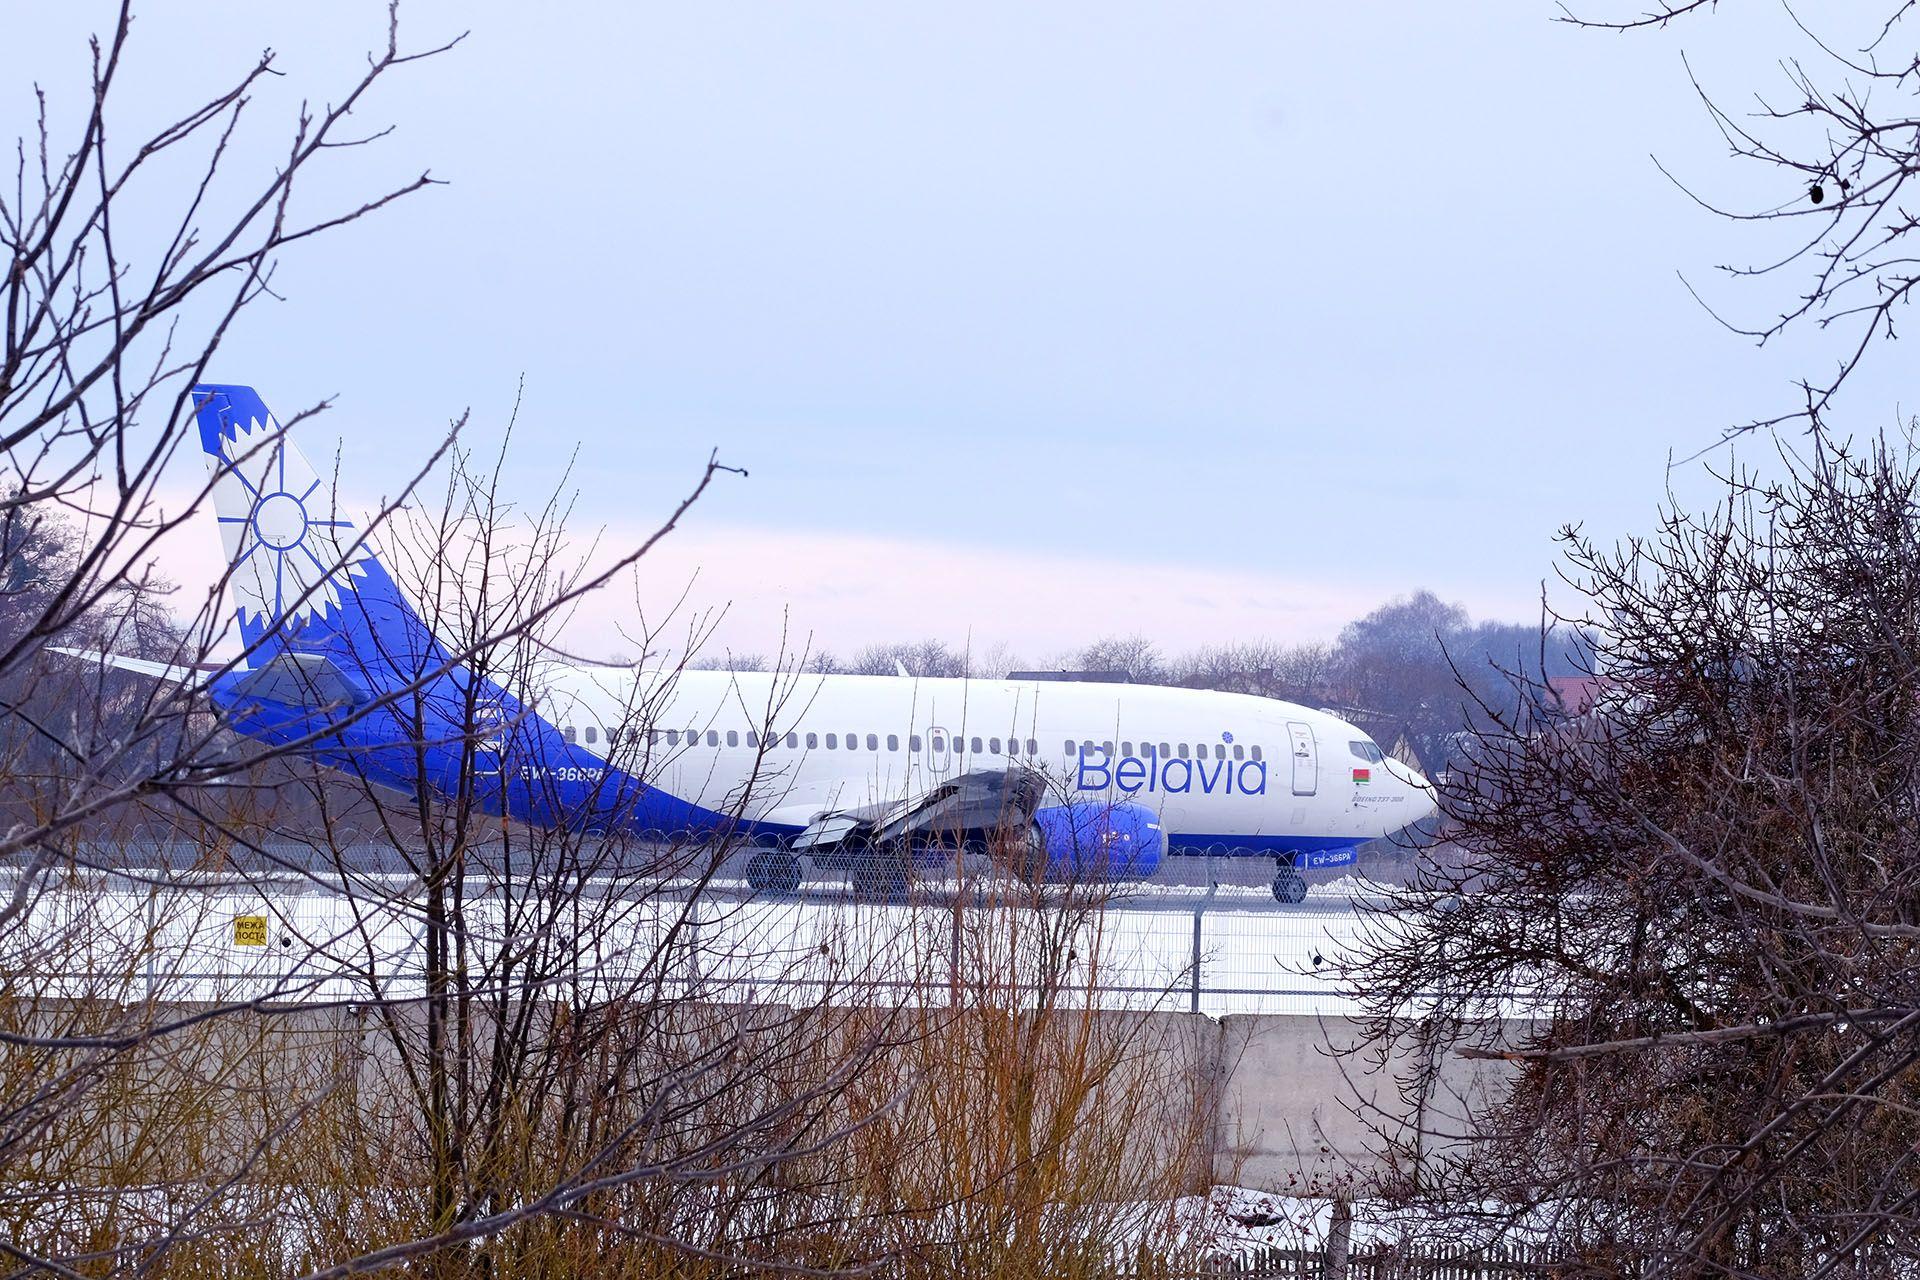 Boeing 737 Belavia